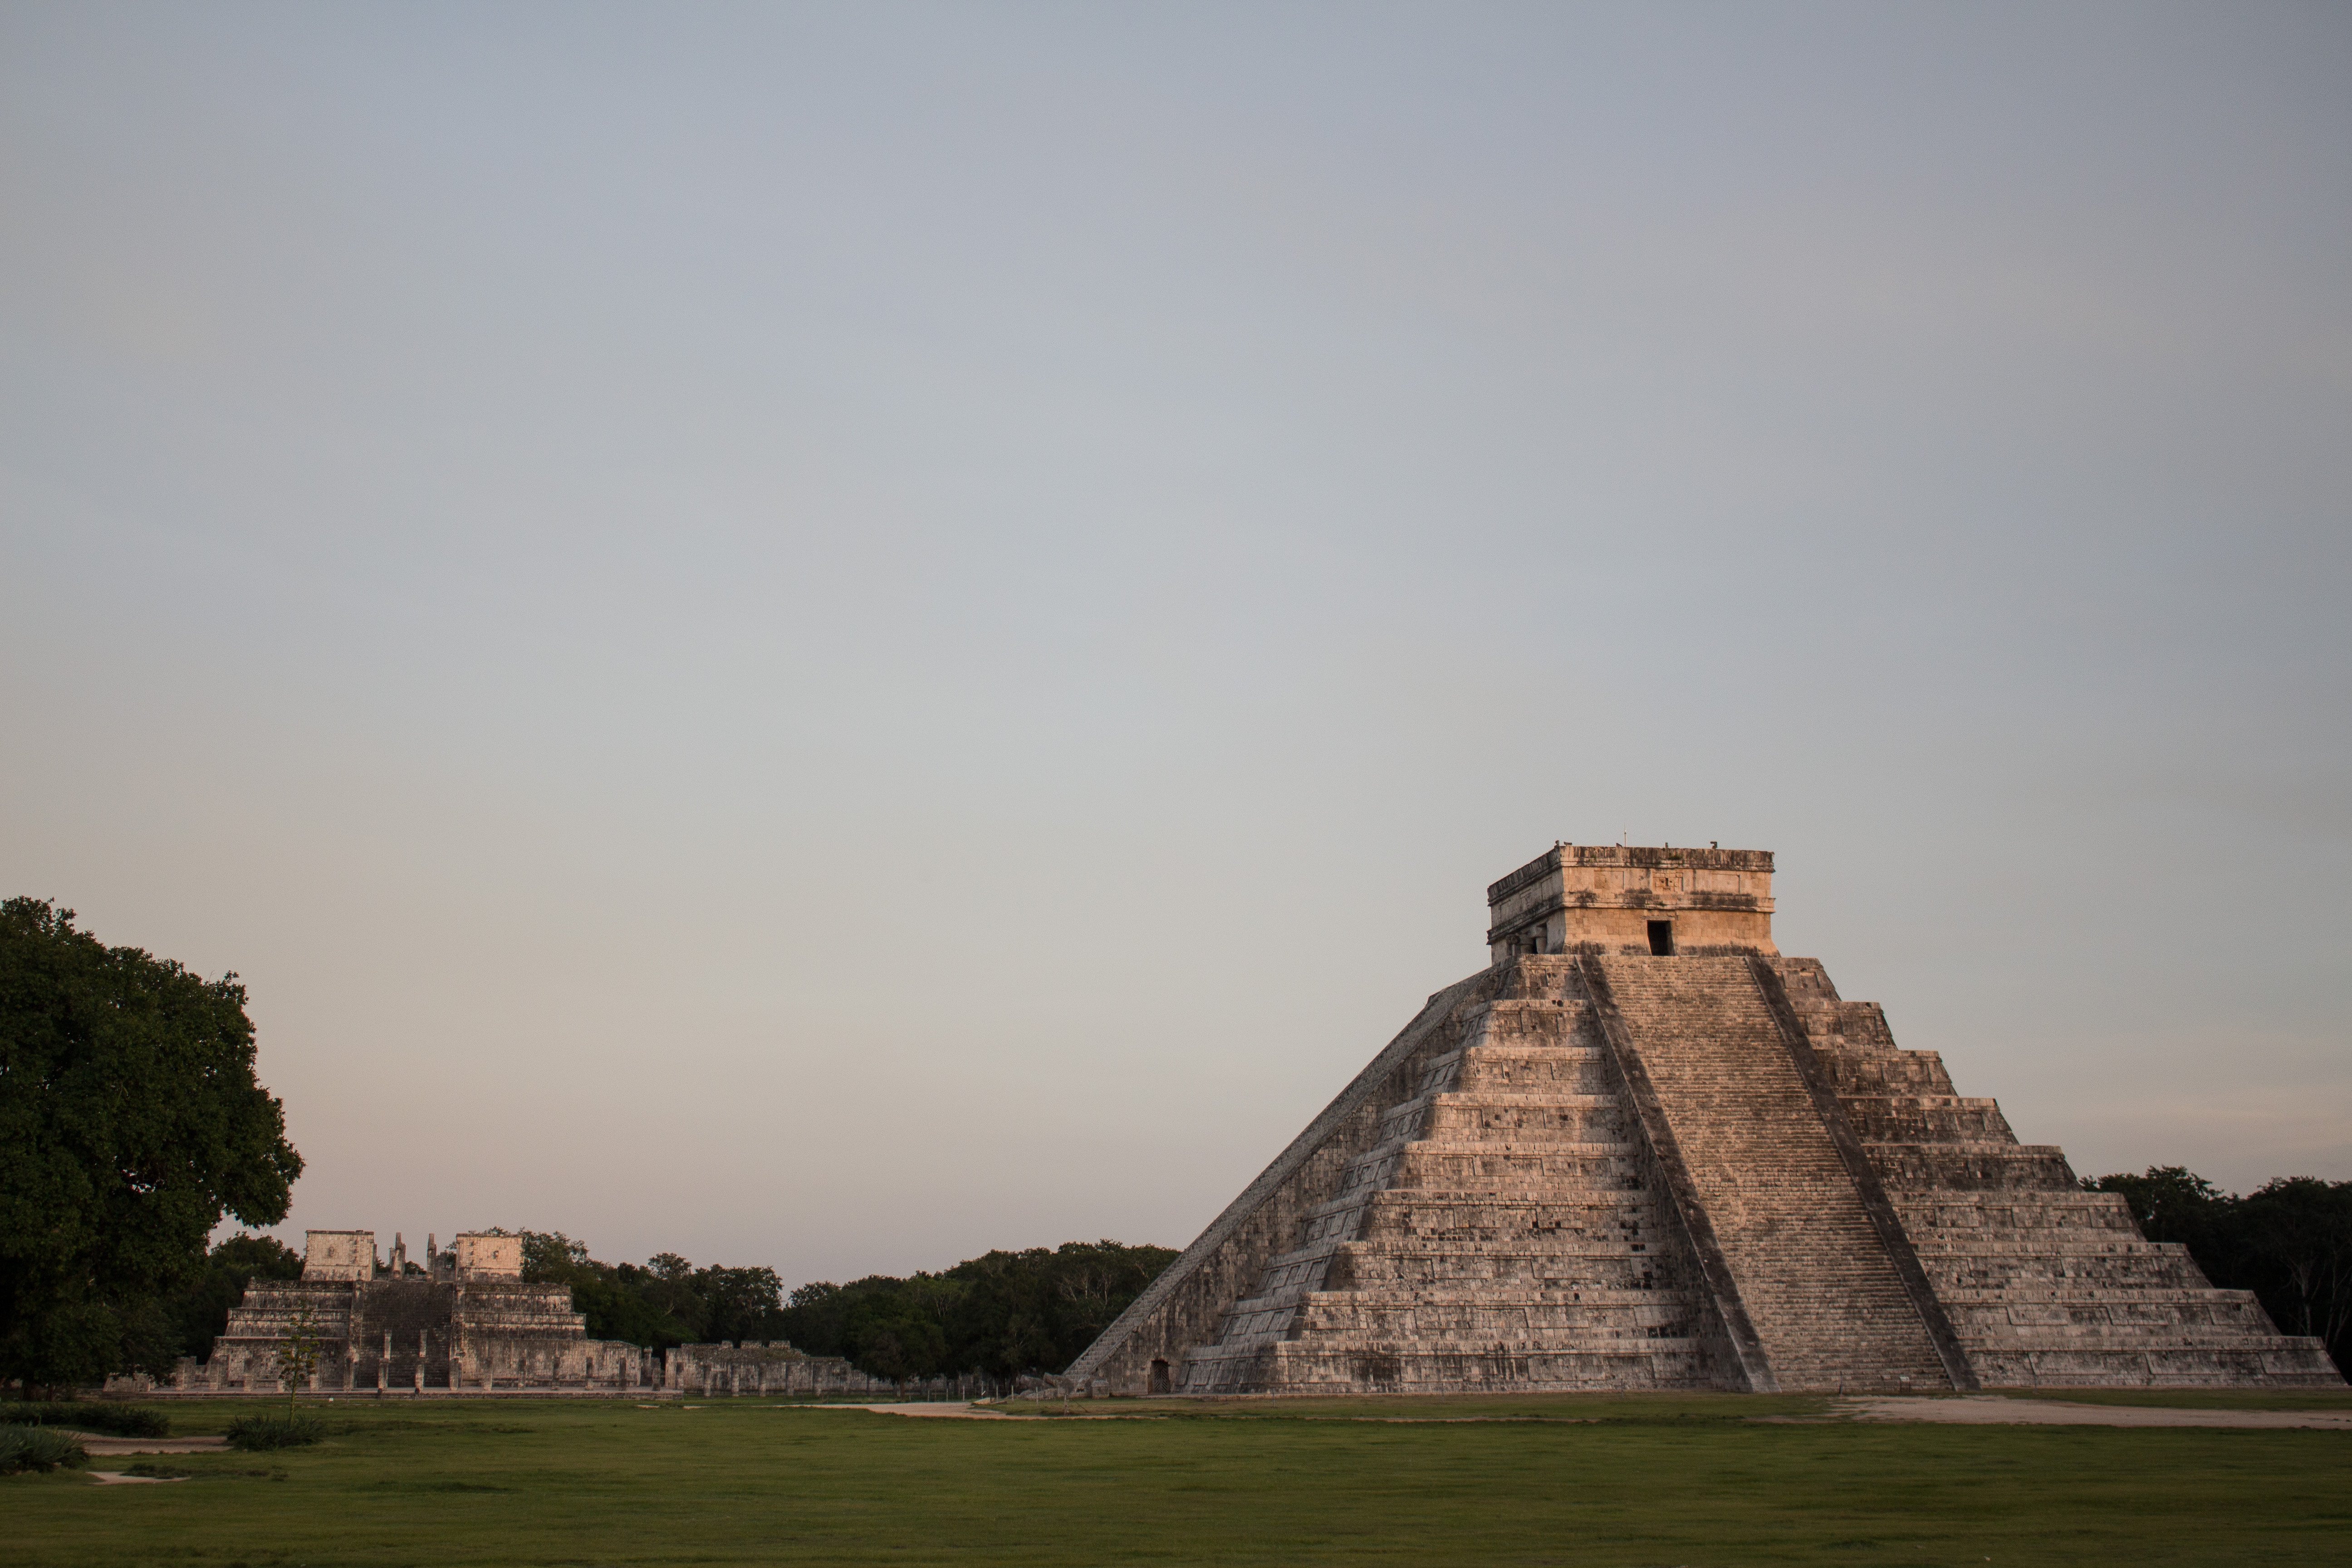 Mayan Pyramids Playa del Carmen Cancun Mexico11   Teaspoon